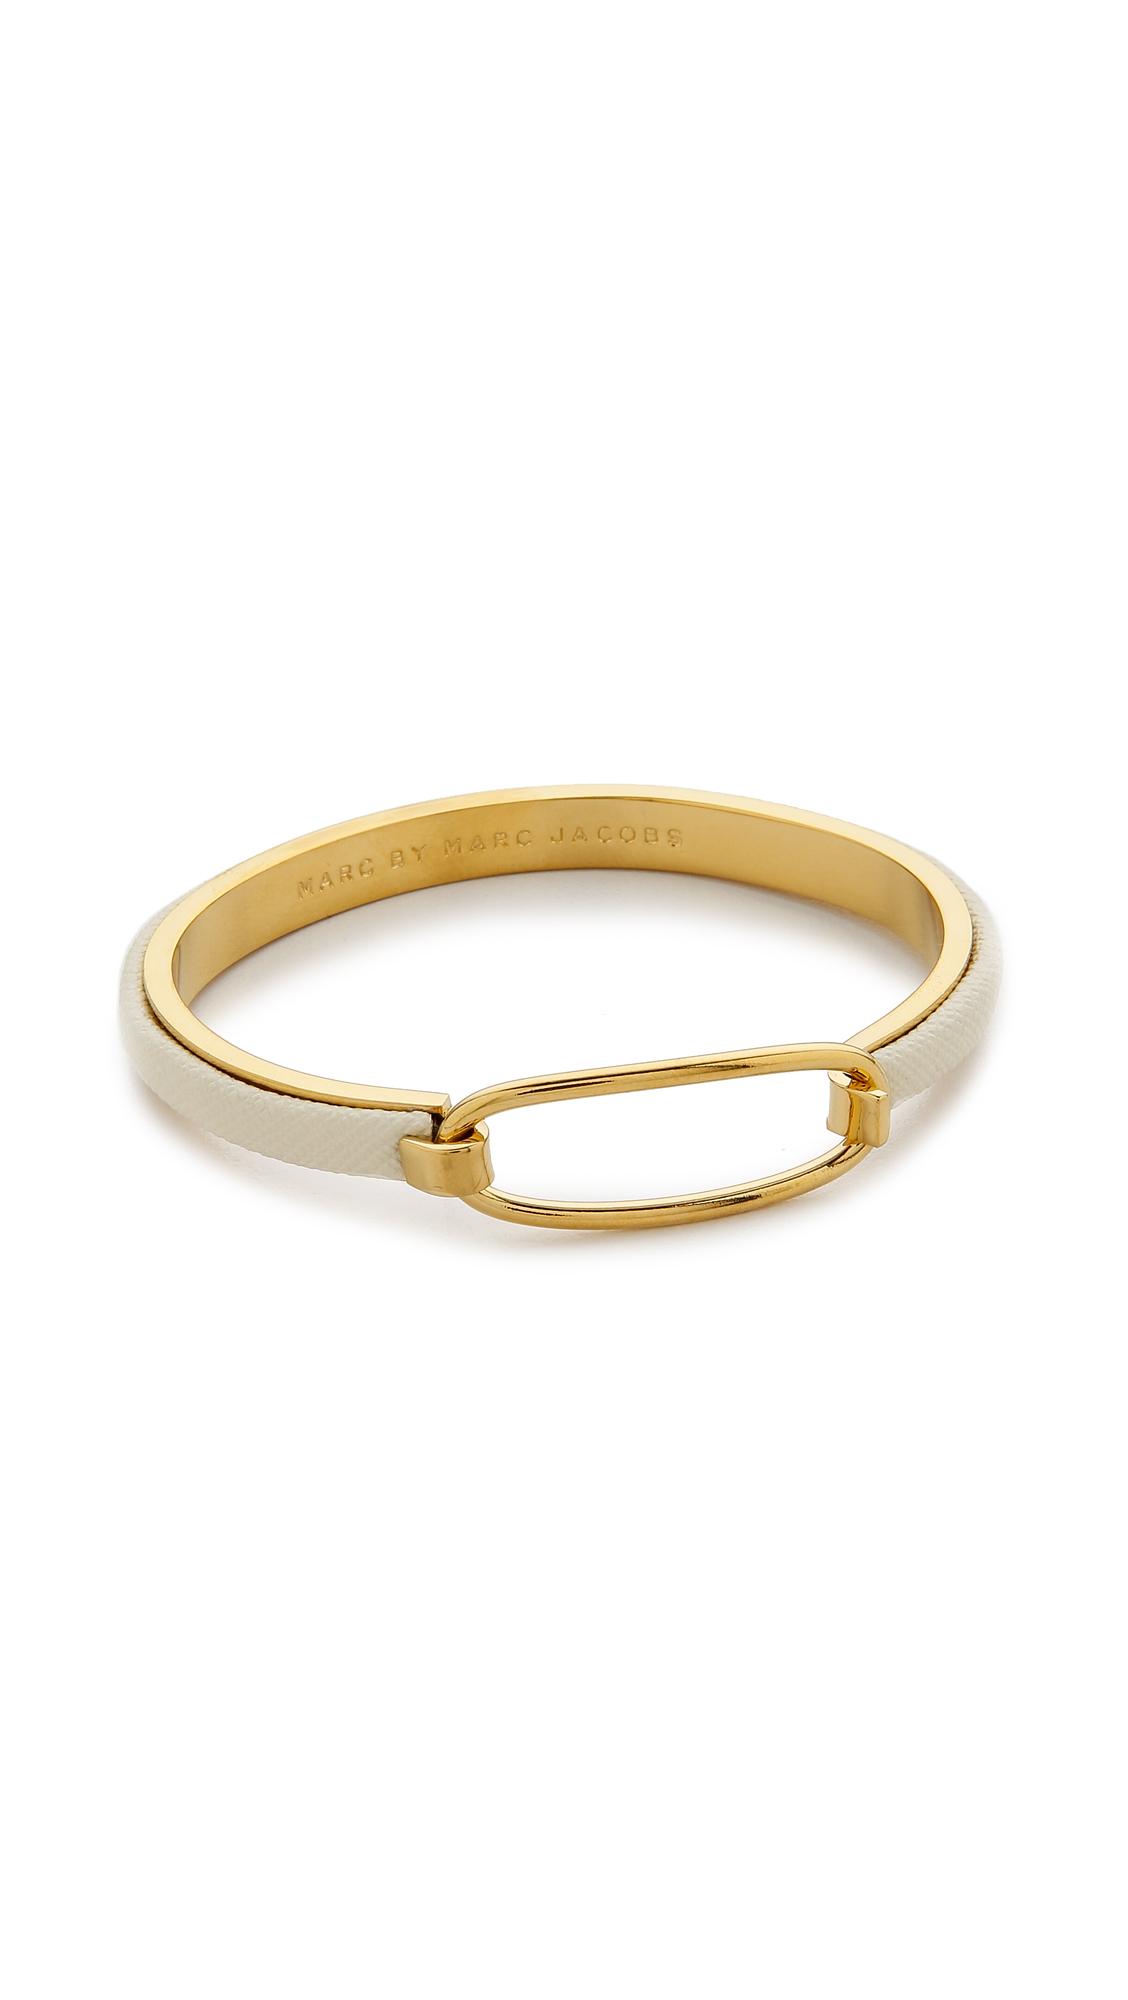 Marc jacobs gold cuff bracelet